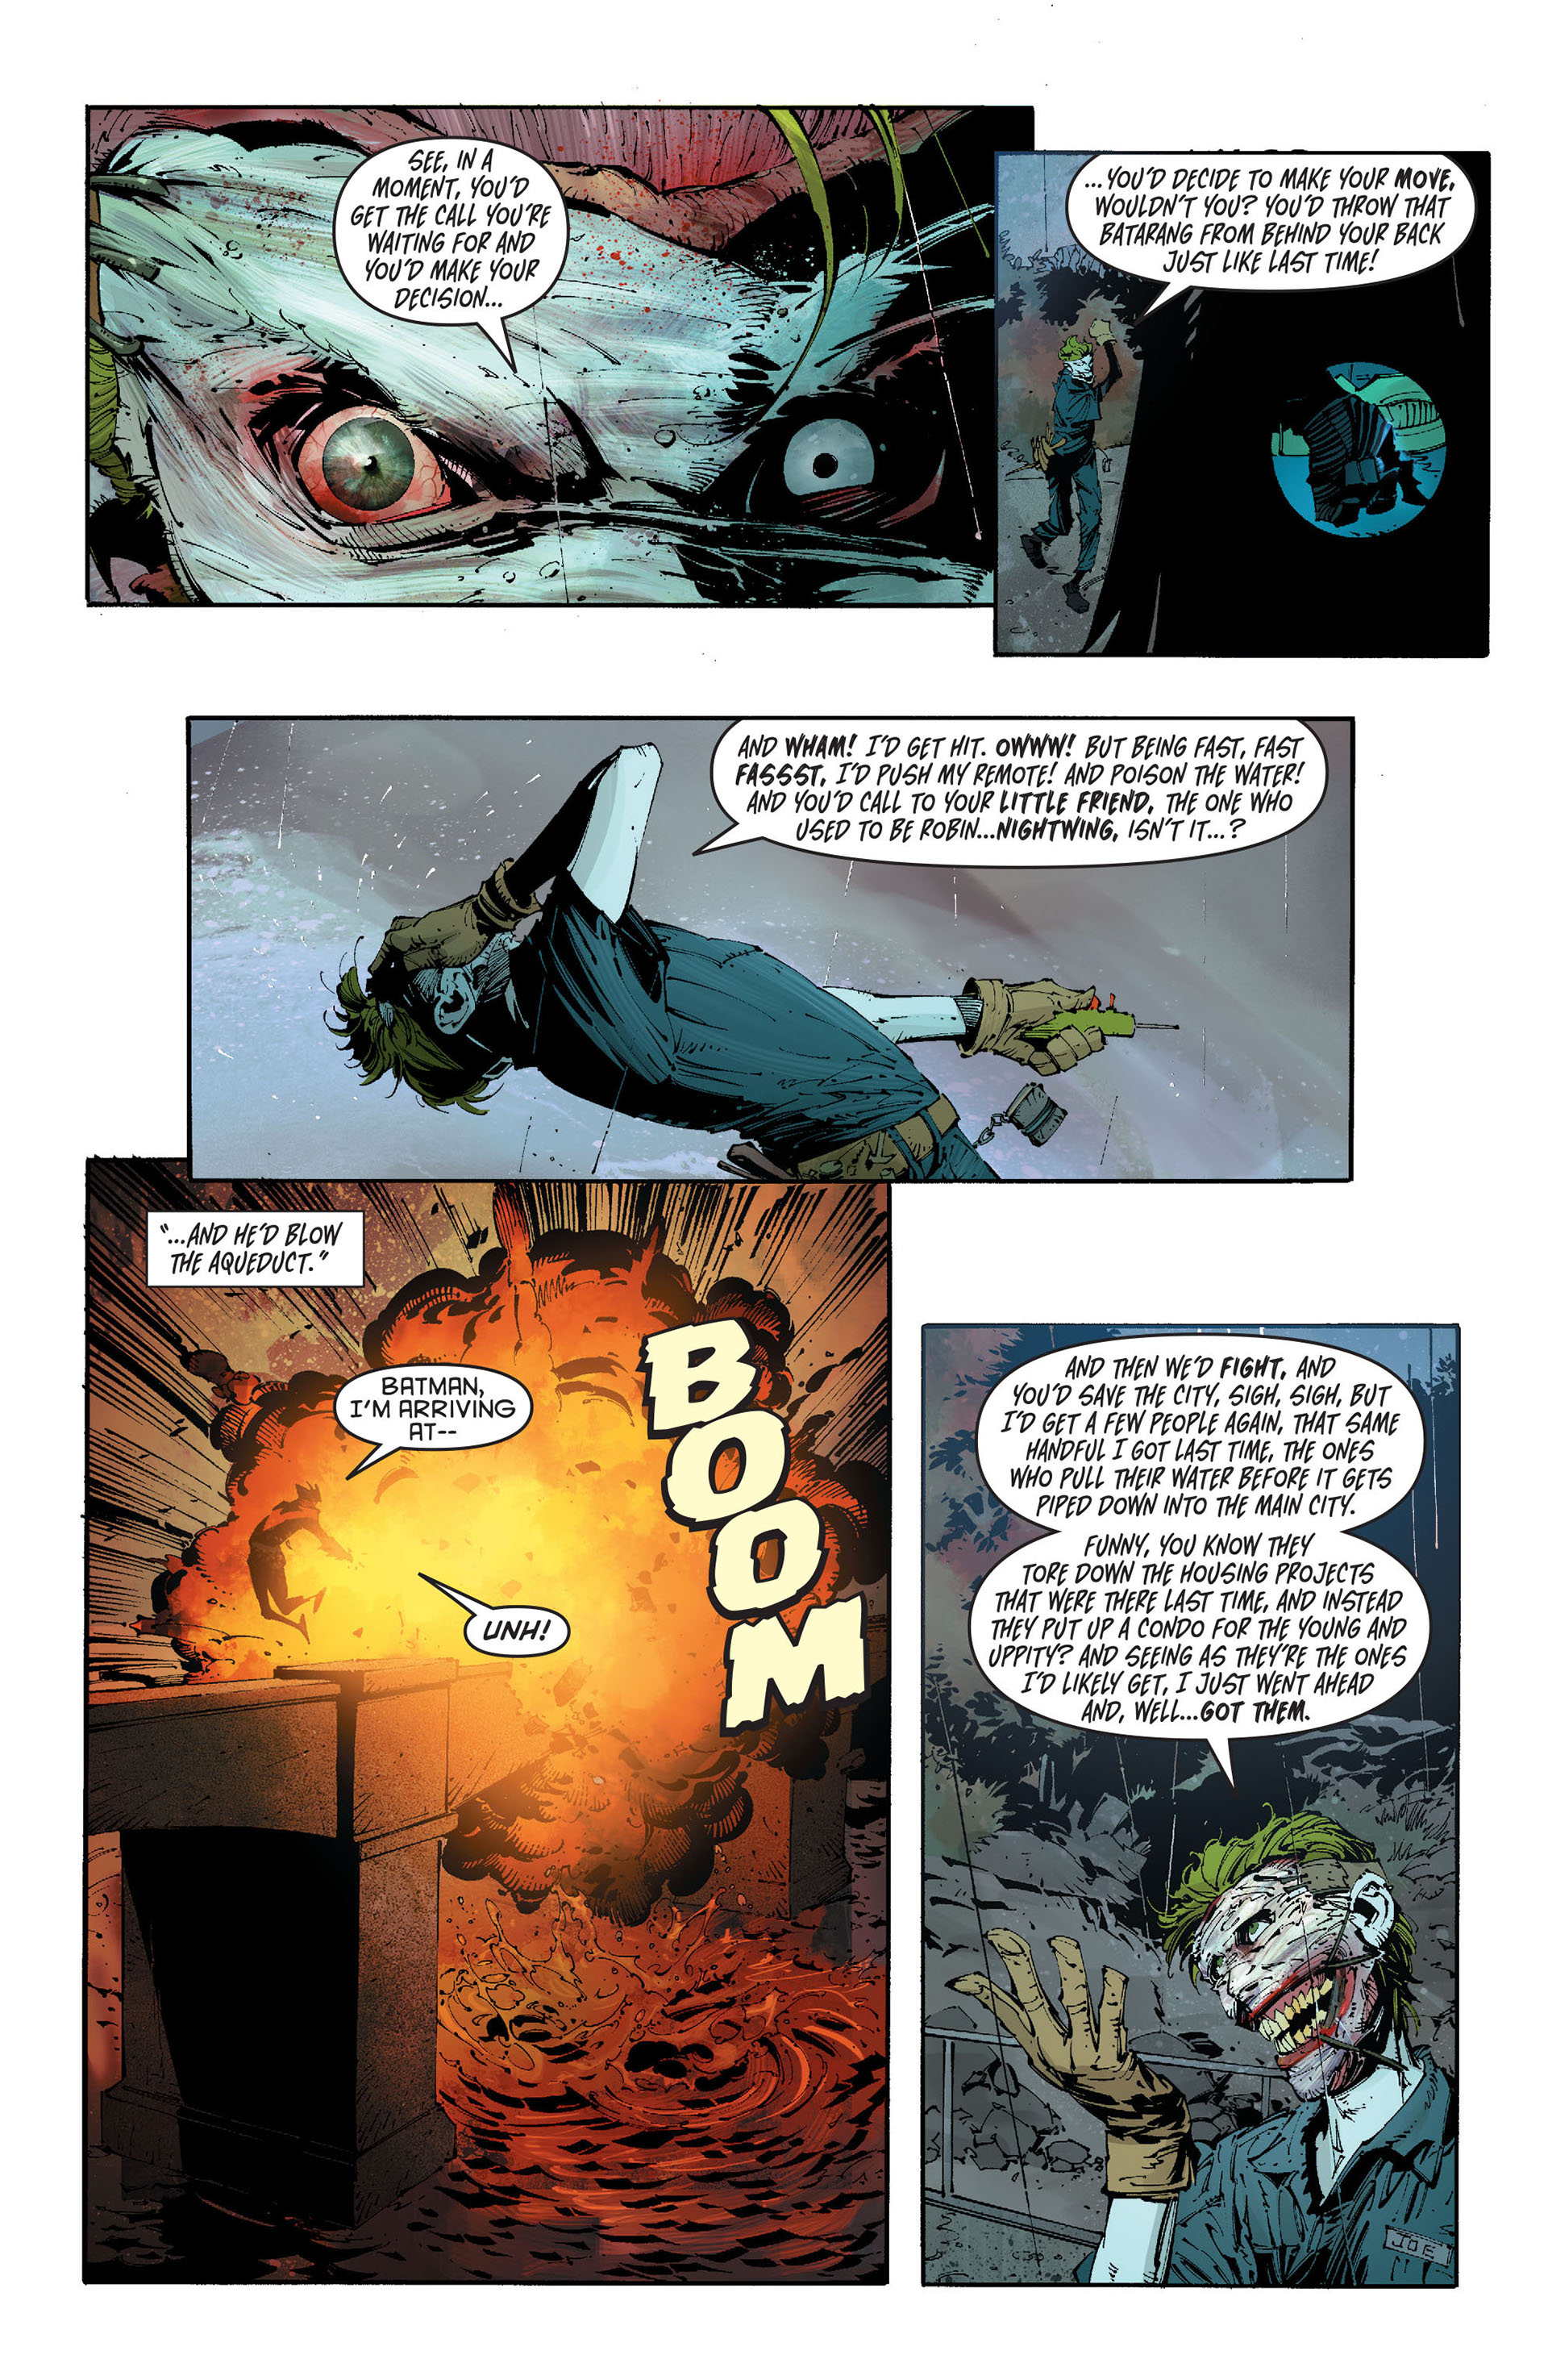 Harley Quinn : Death of the Family Harley24-3c2cde1